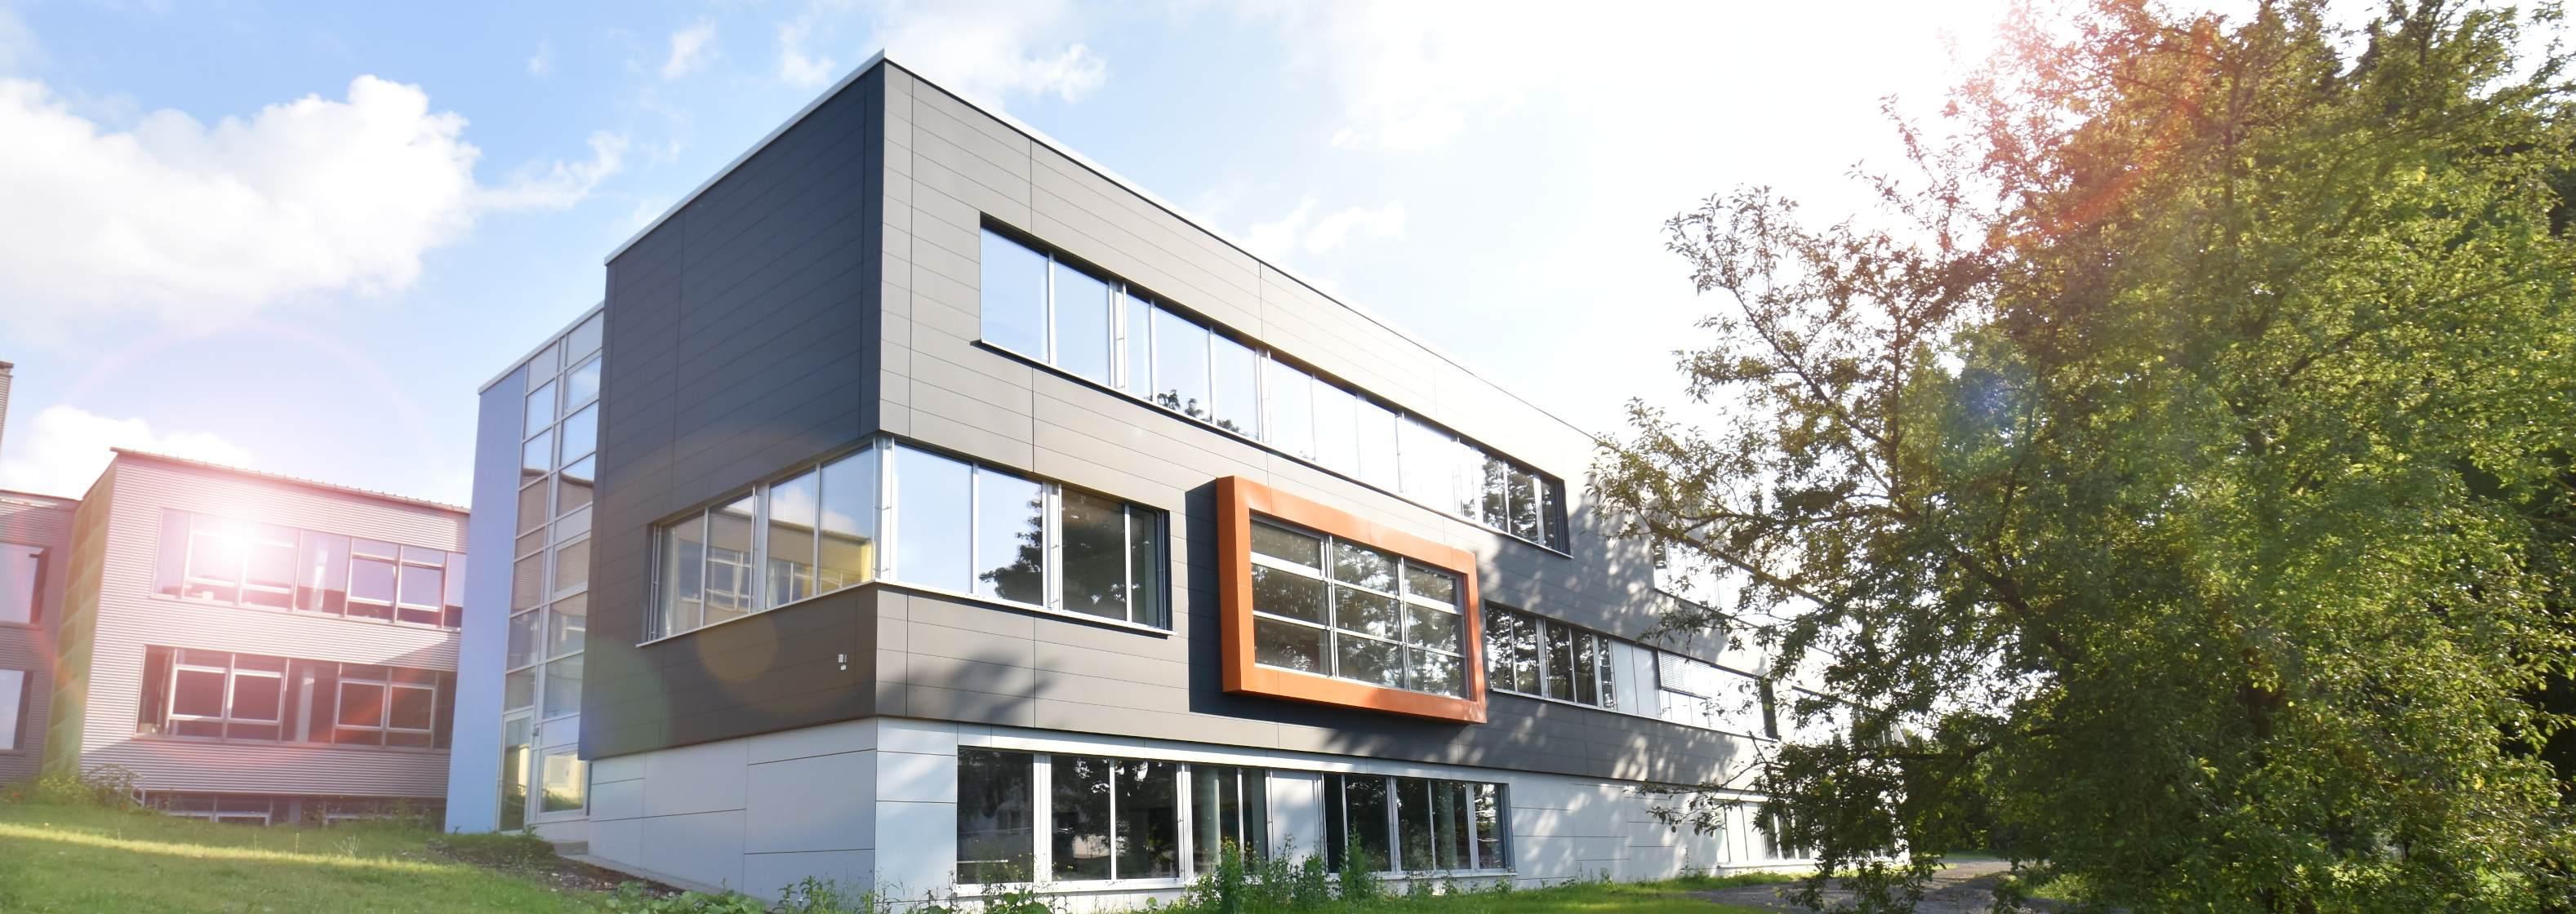 Neubau der Sek II der Gesamtschule . Büren